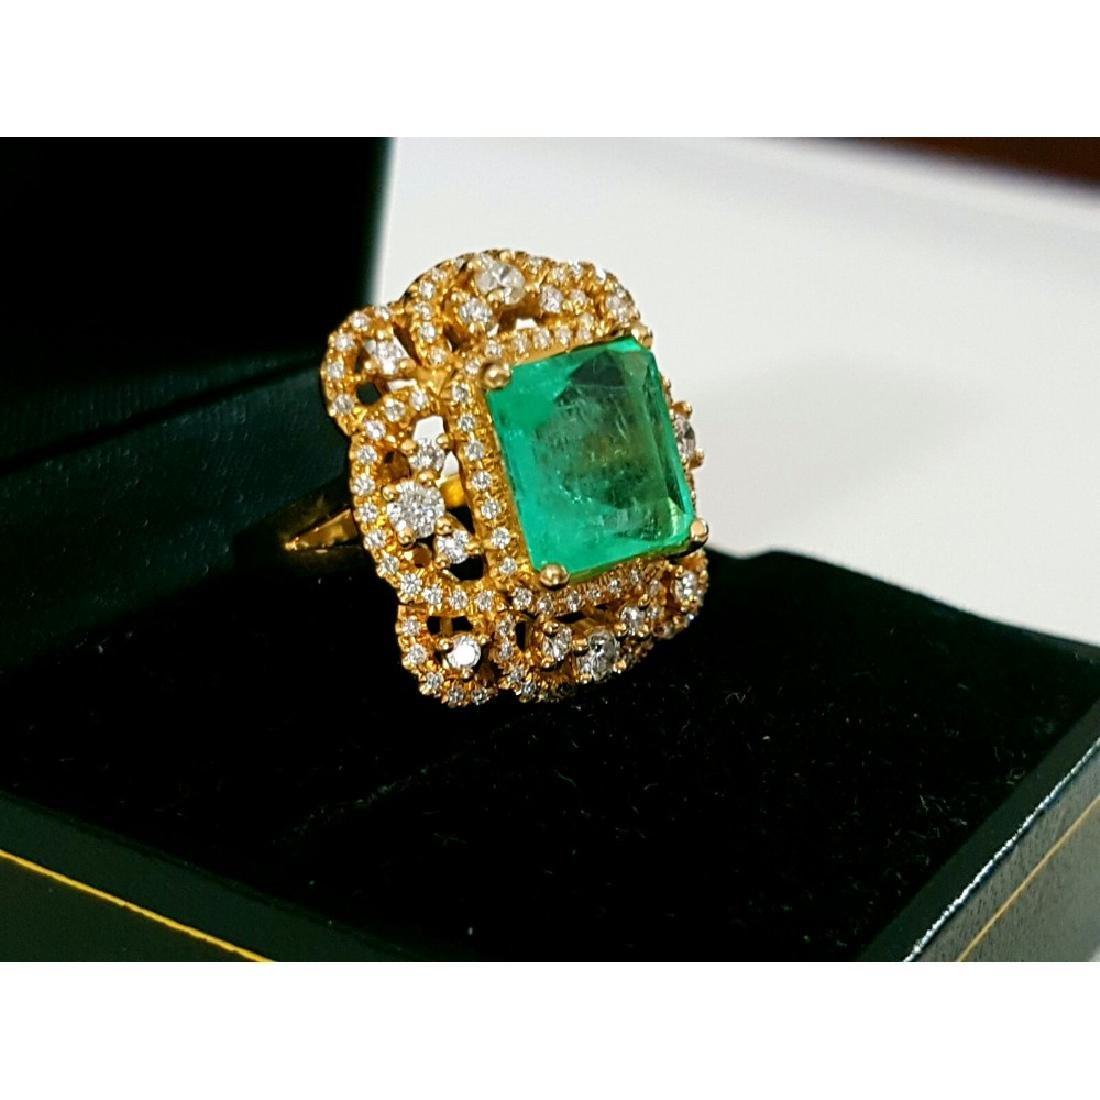 18k Gold Vintage 6 ct Emerald Diamond Cocktail Ring - 3